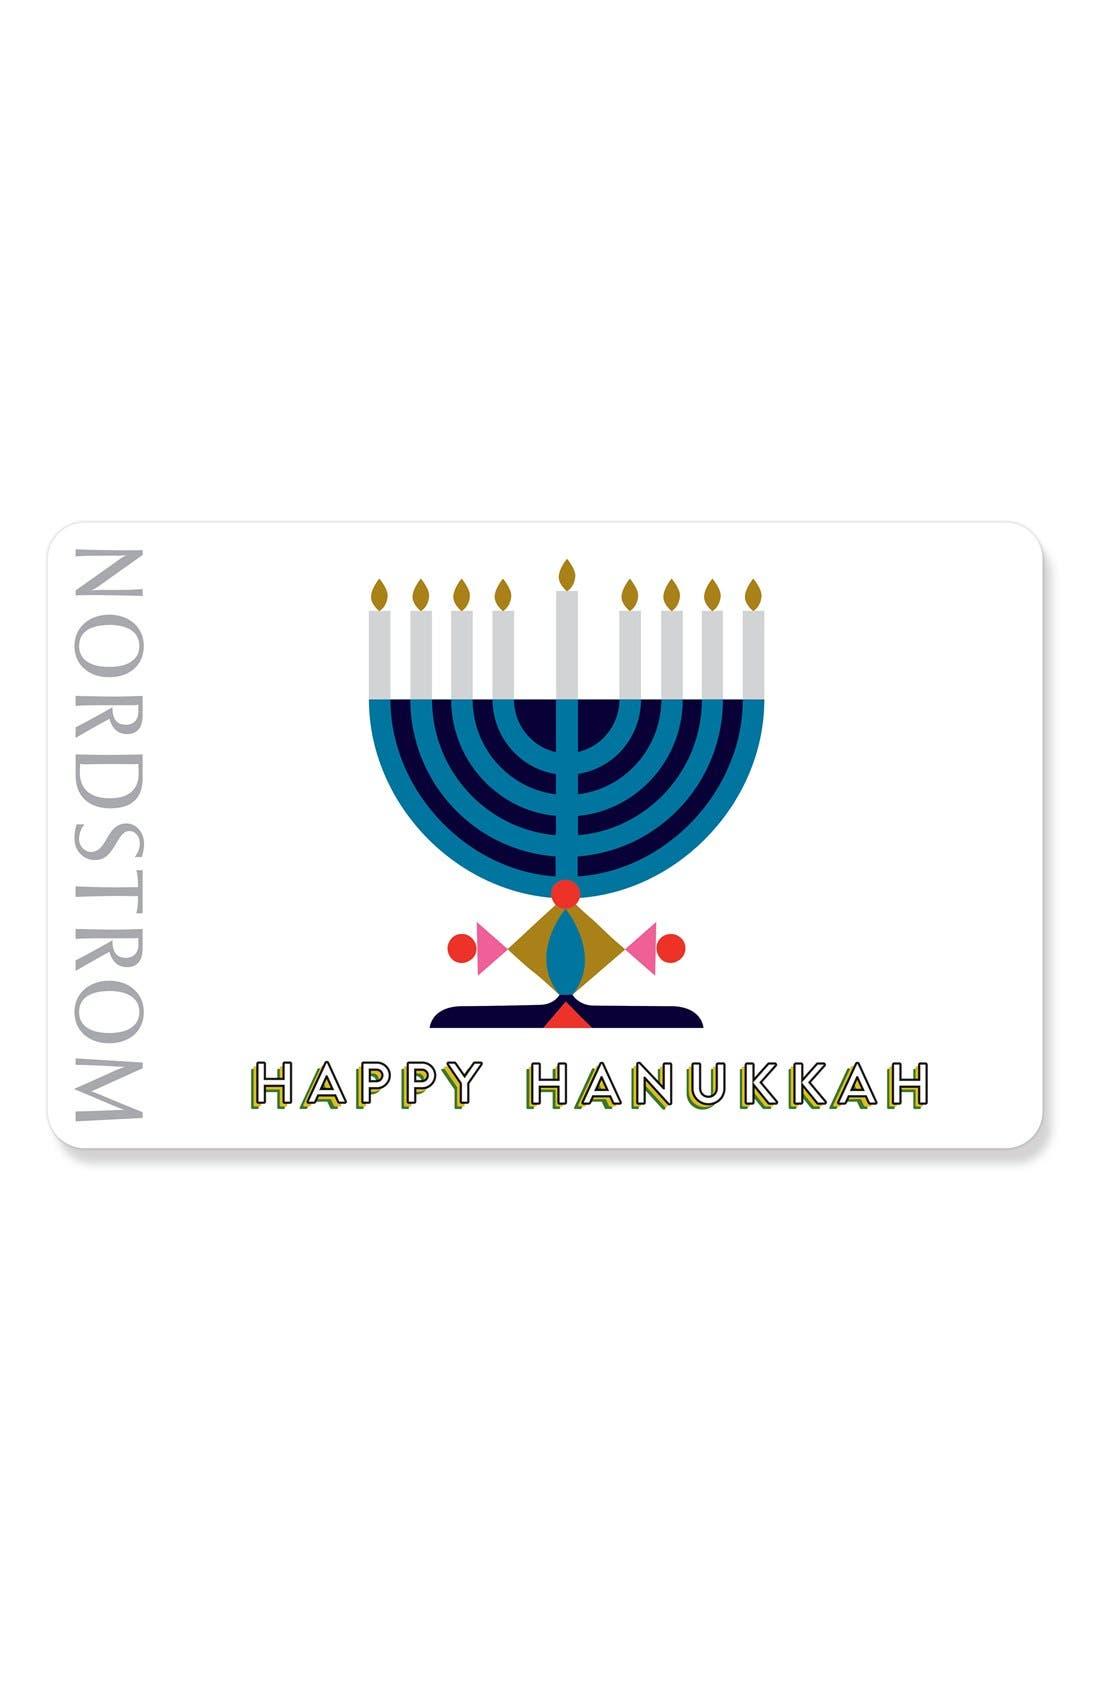 Nordstrom Happy Hanukkah Gift Card